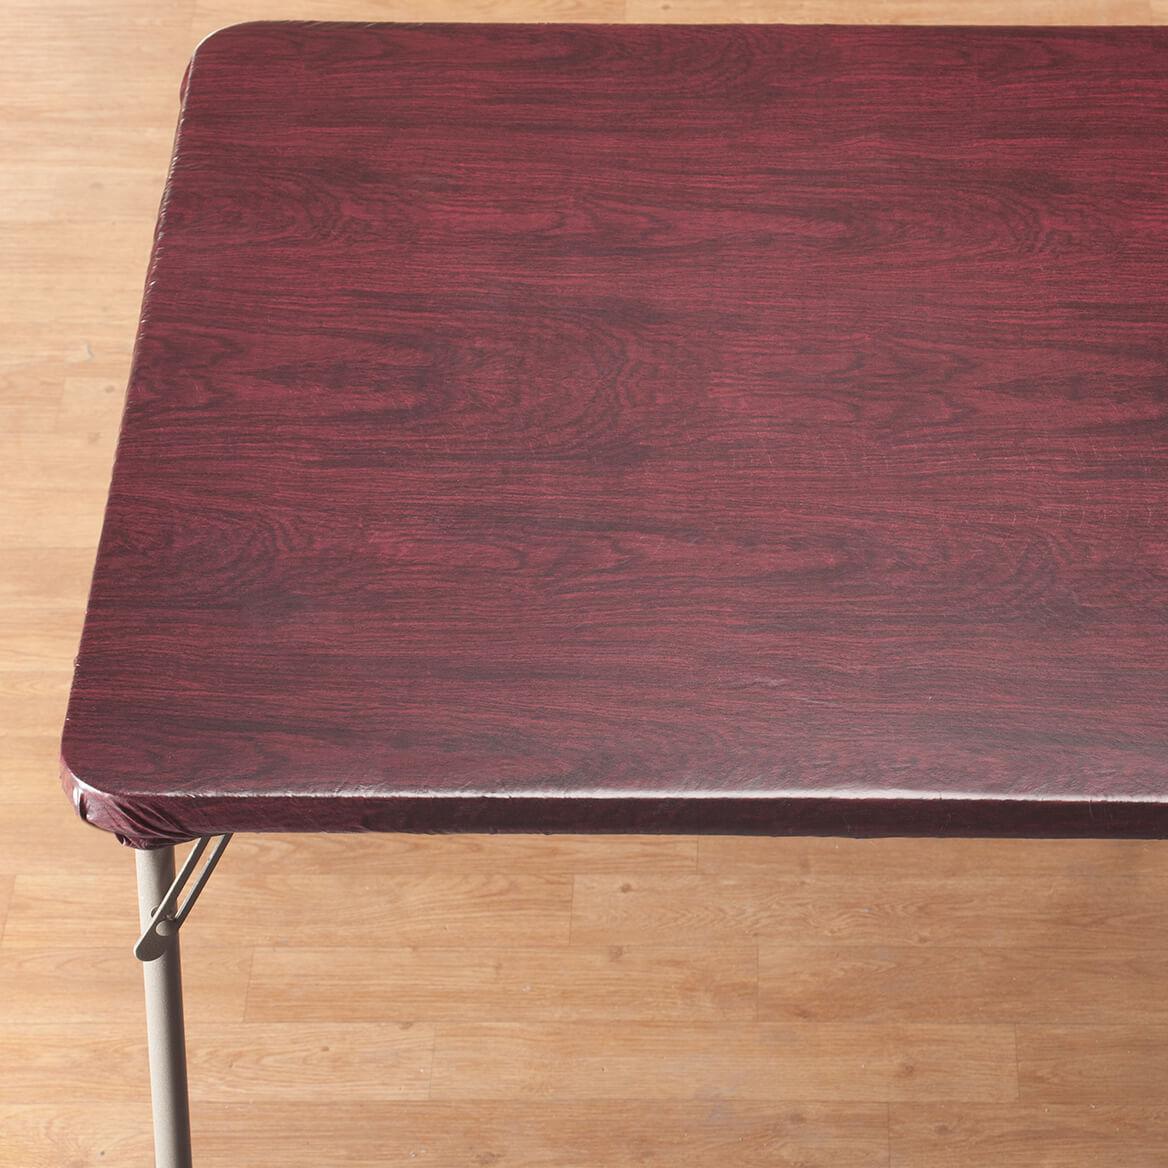 Wood Grain Elasticized Table Cover Miles Kimball